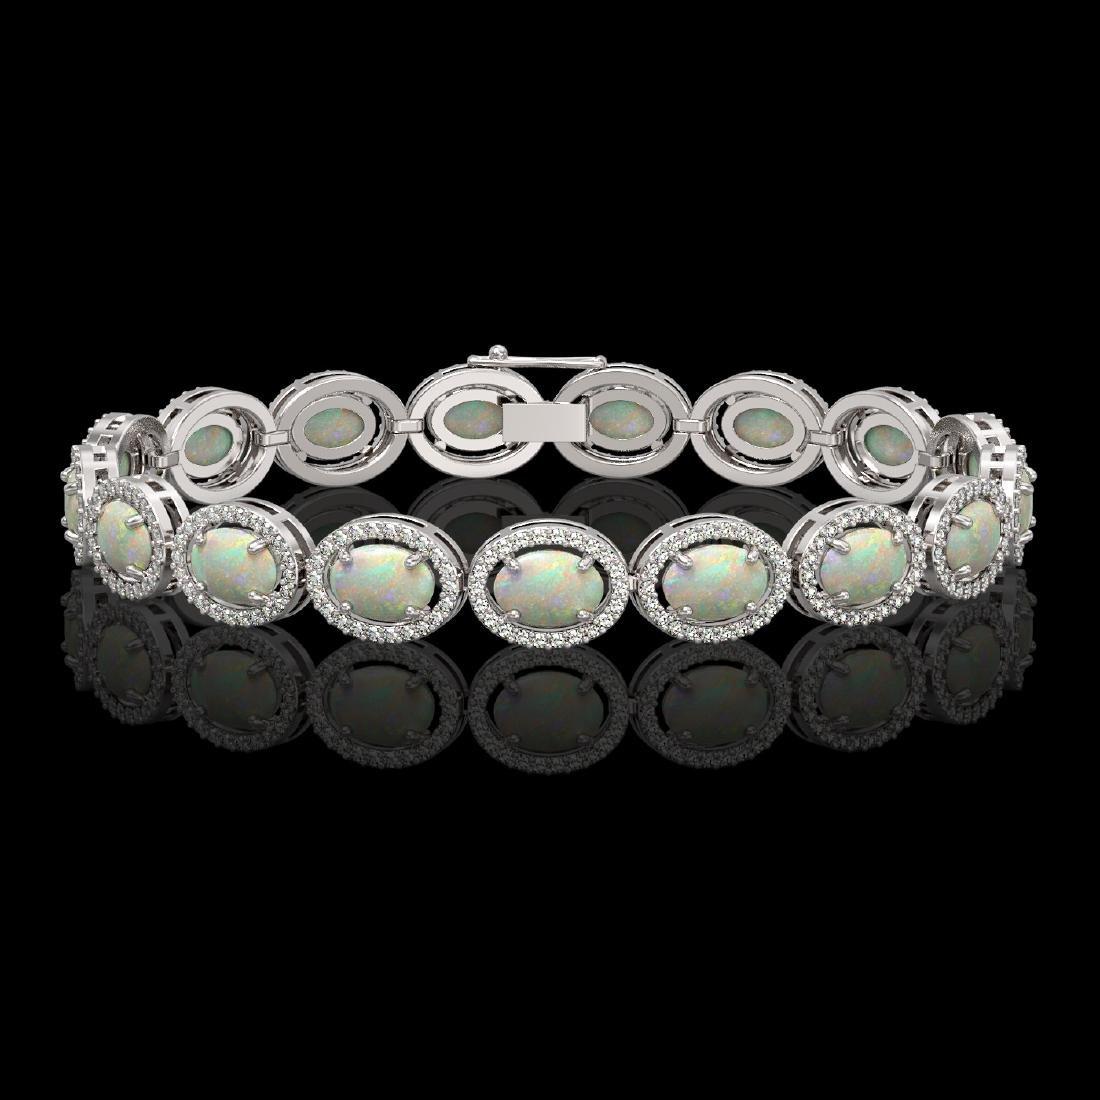 14.24 CTW Opal & Diamond Halo Bracelet 10K White Gold